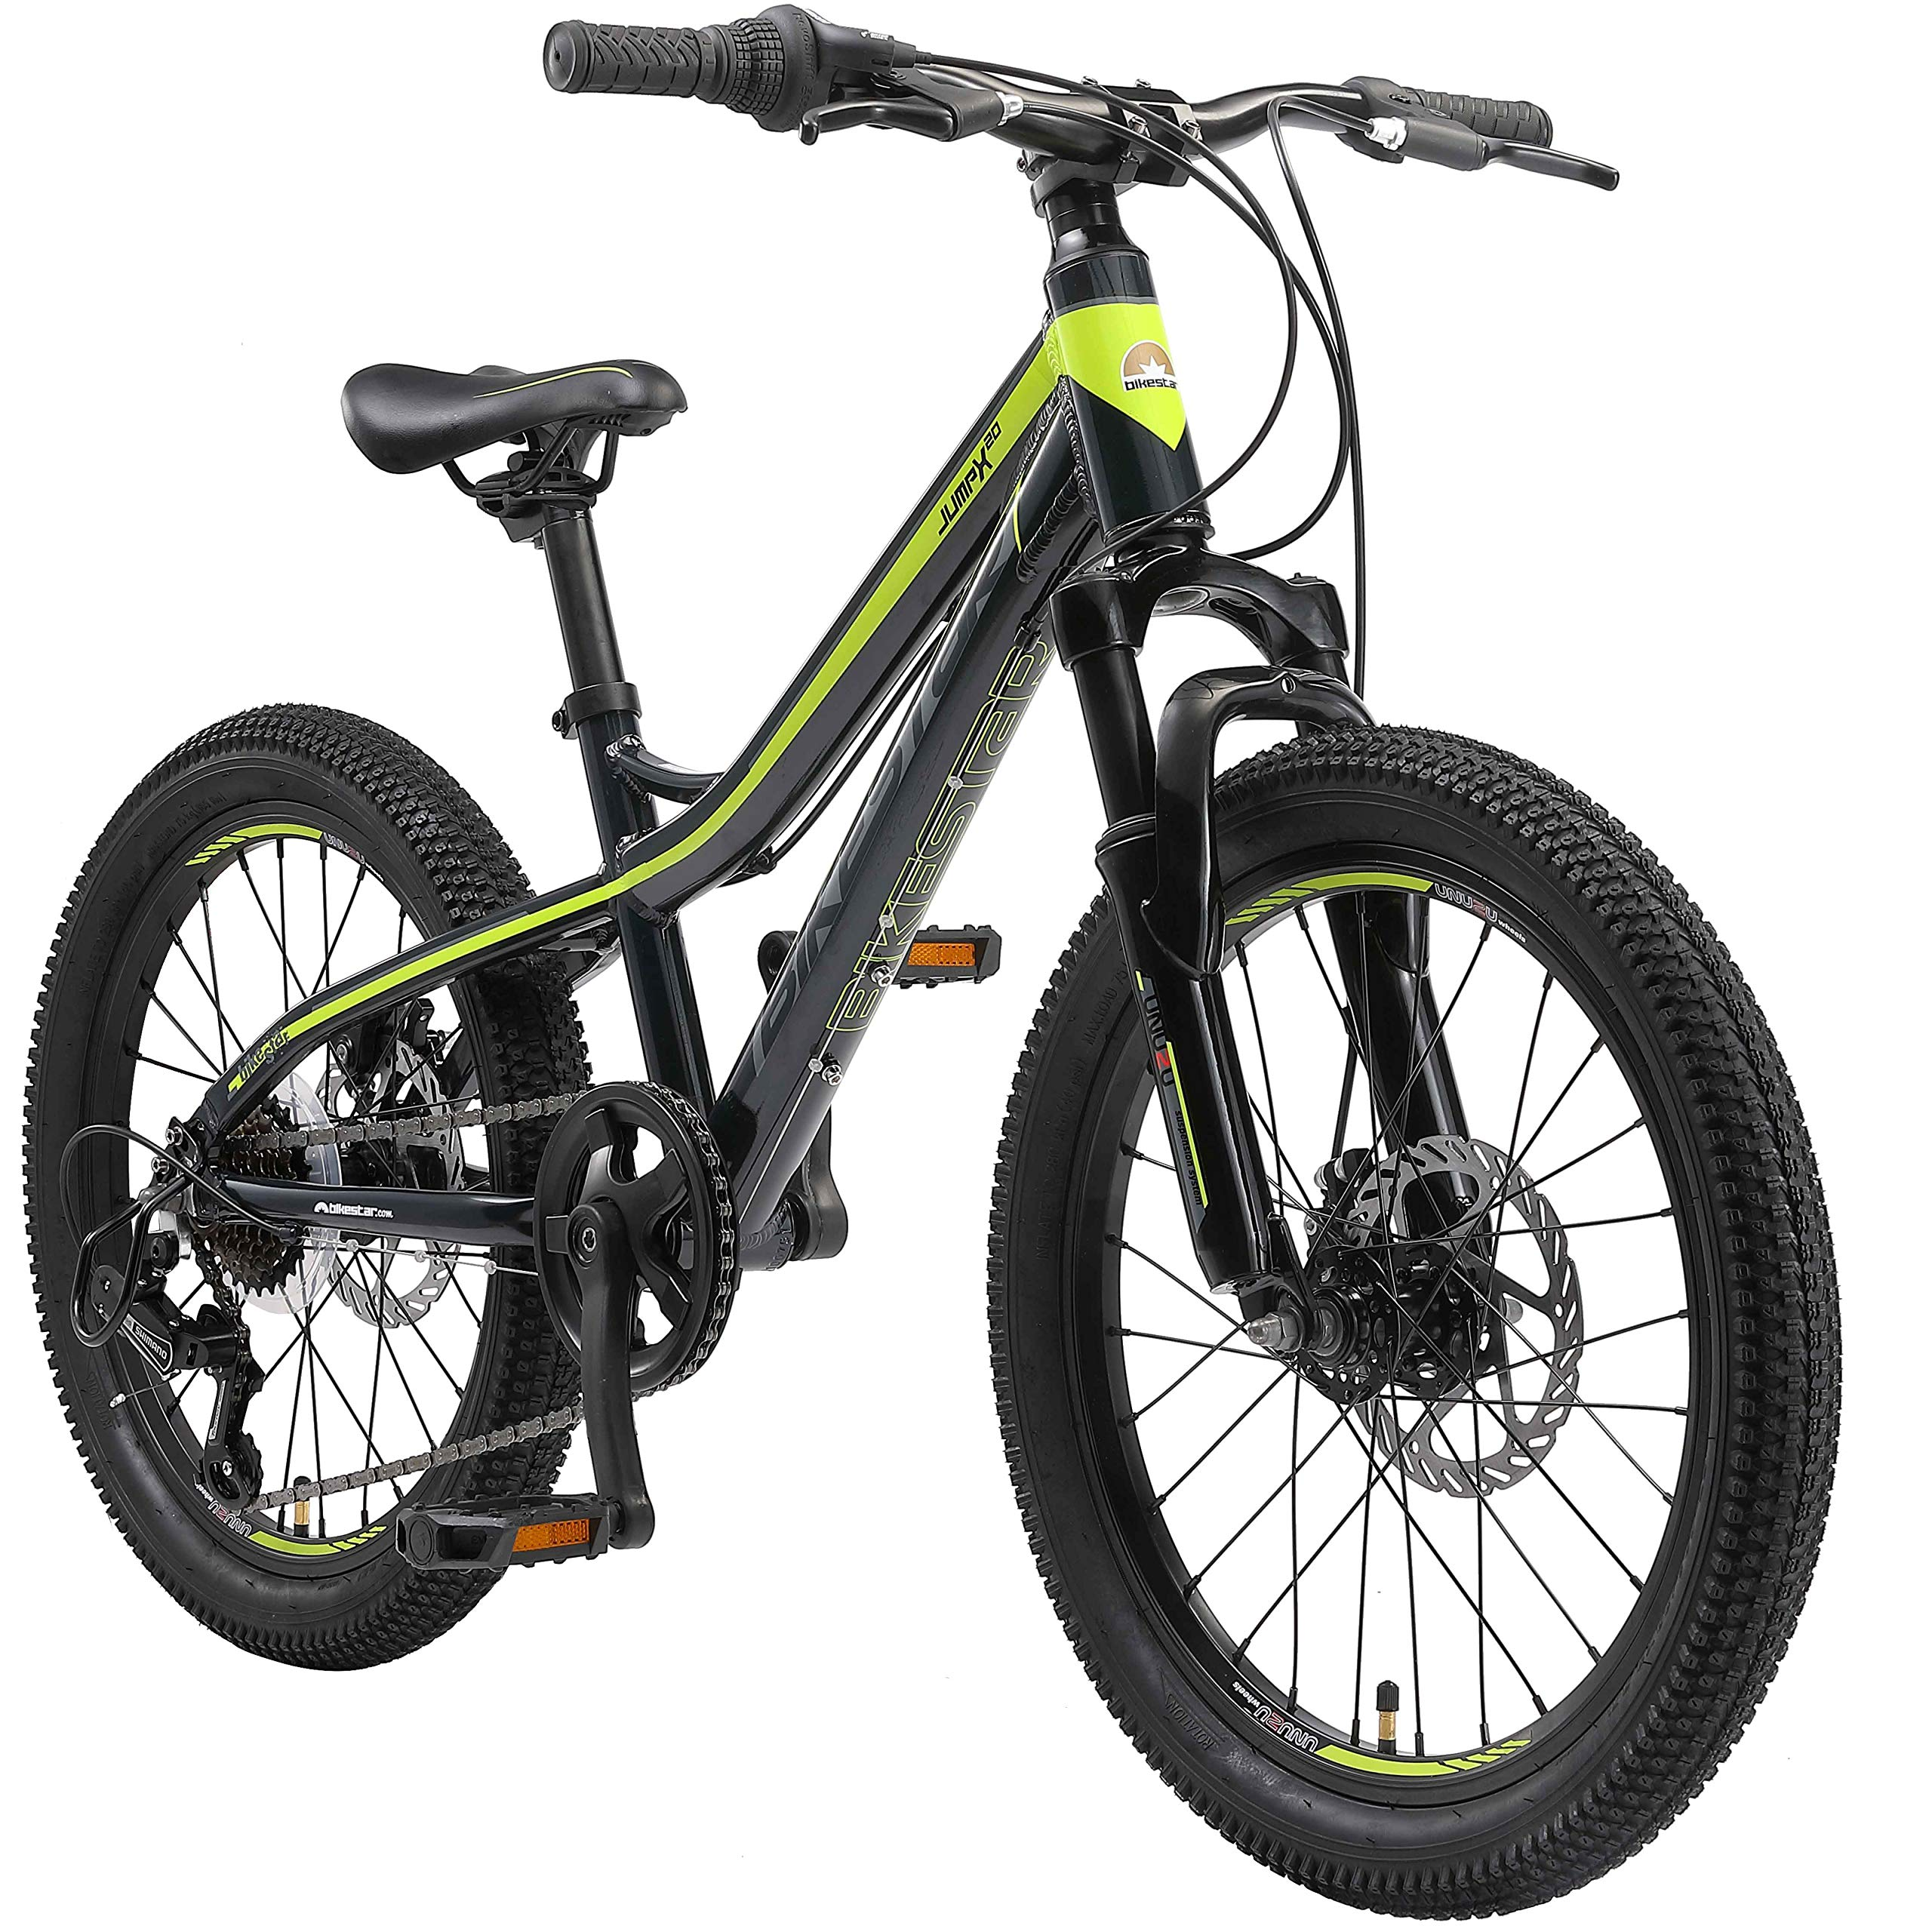 BIKESTAR Kids Mountain bike aluminium 20 Inch 6-9 years   Children youth bicycle 7 gear Shimano, Disc Brake, Suspension…